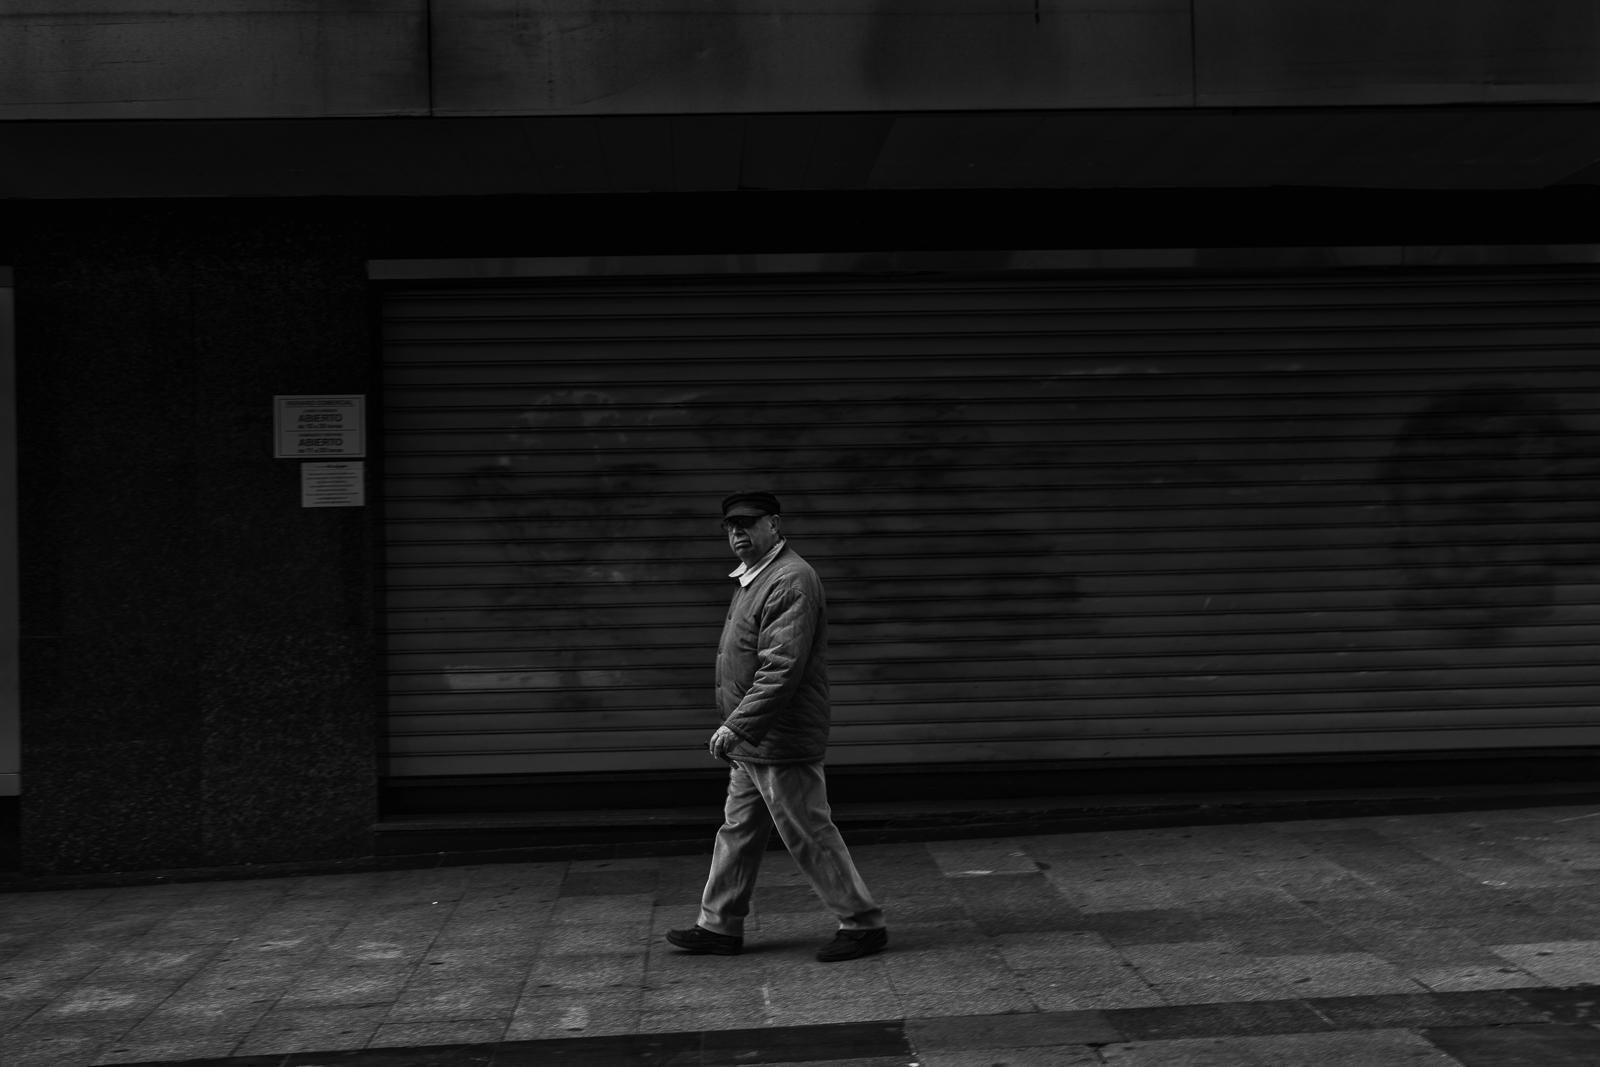 A elderly man walking in Preciados Street in Madrid city center during the coronavirus lockdown.